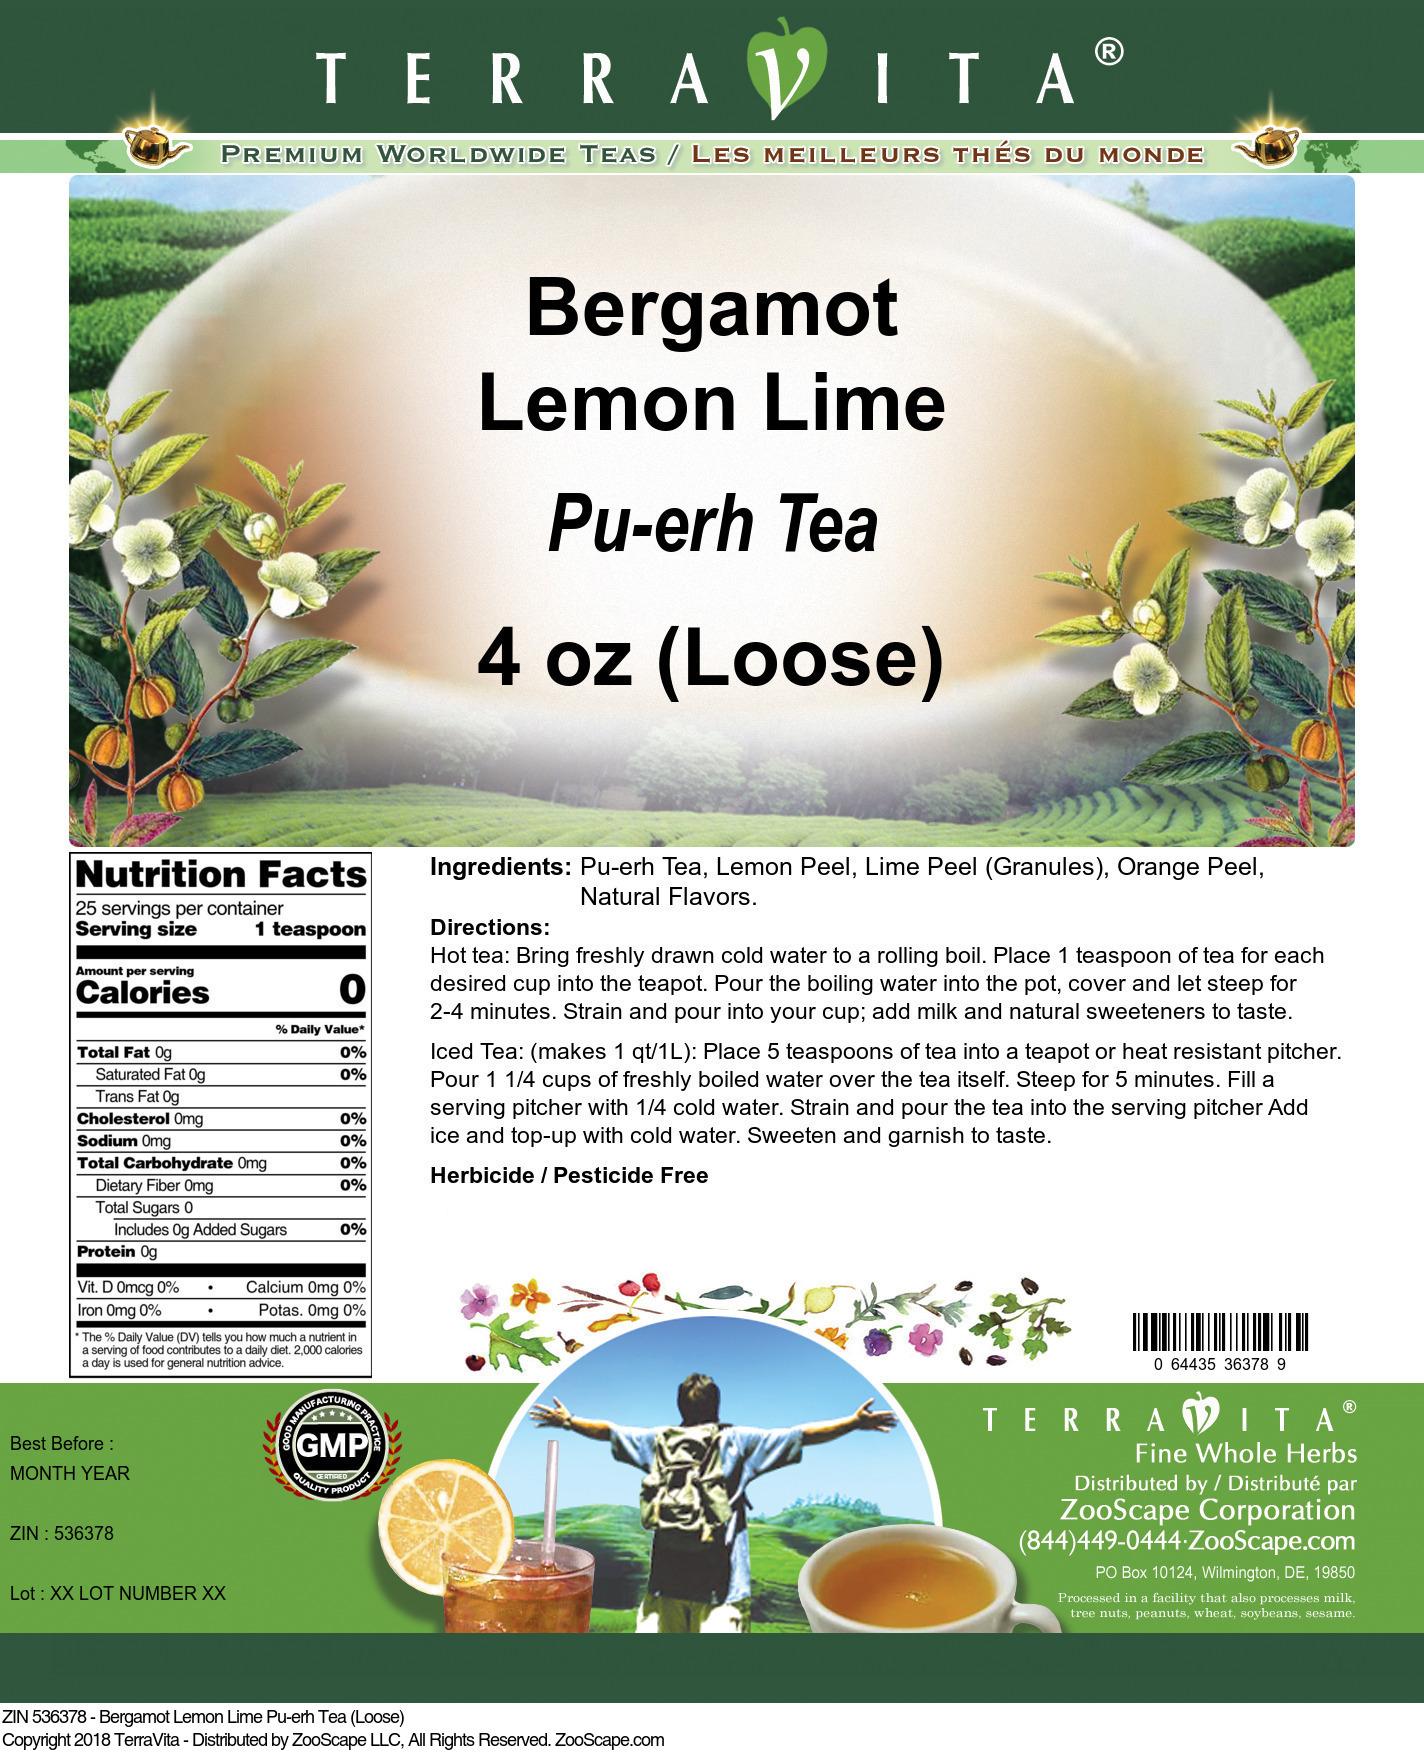 Bergamot Lemon Lime Pu-erh Tea (Loose)